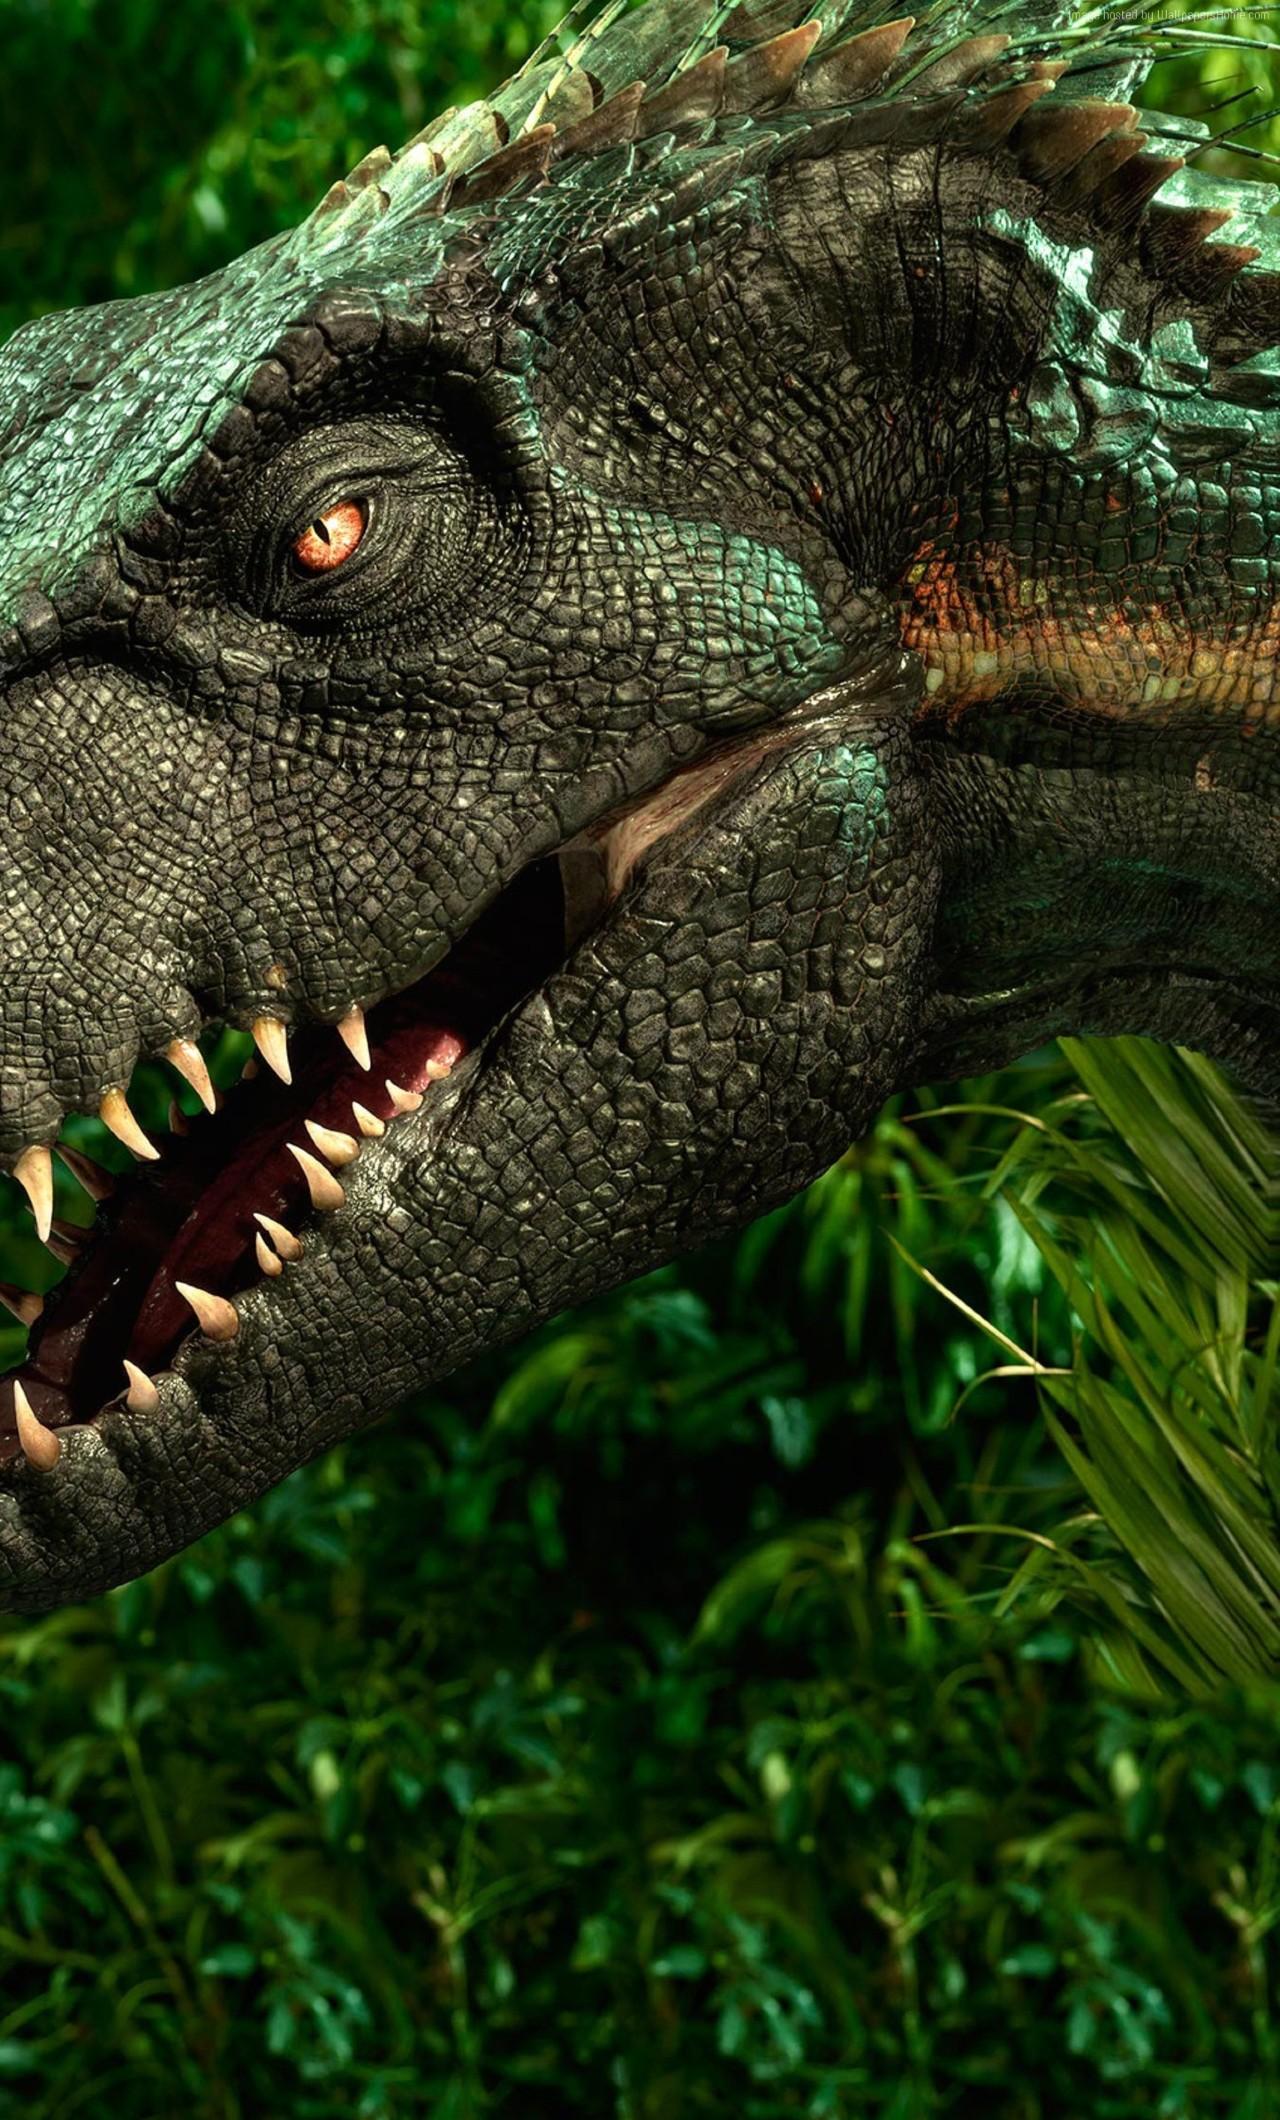 Iphone Dinosaur Wallpaper Hd - HD Wallpaper